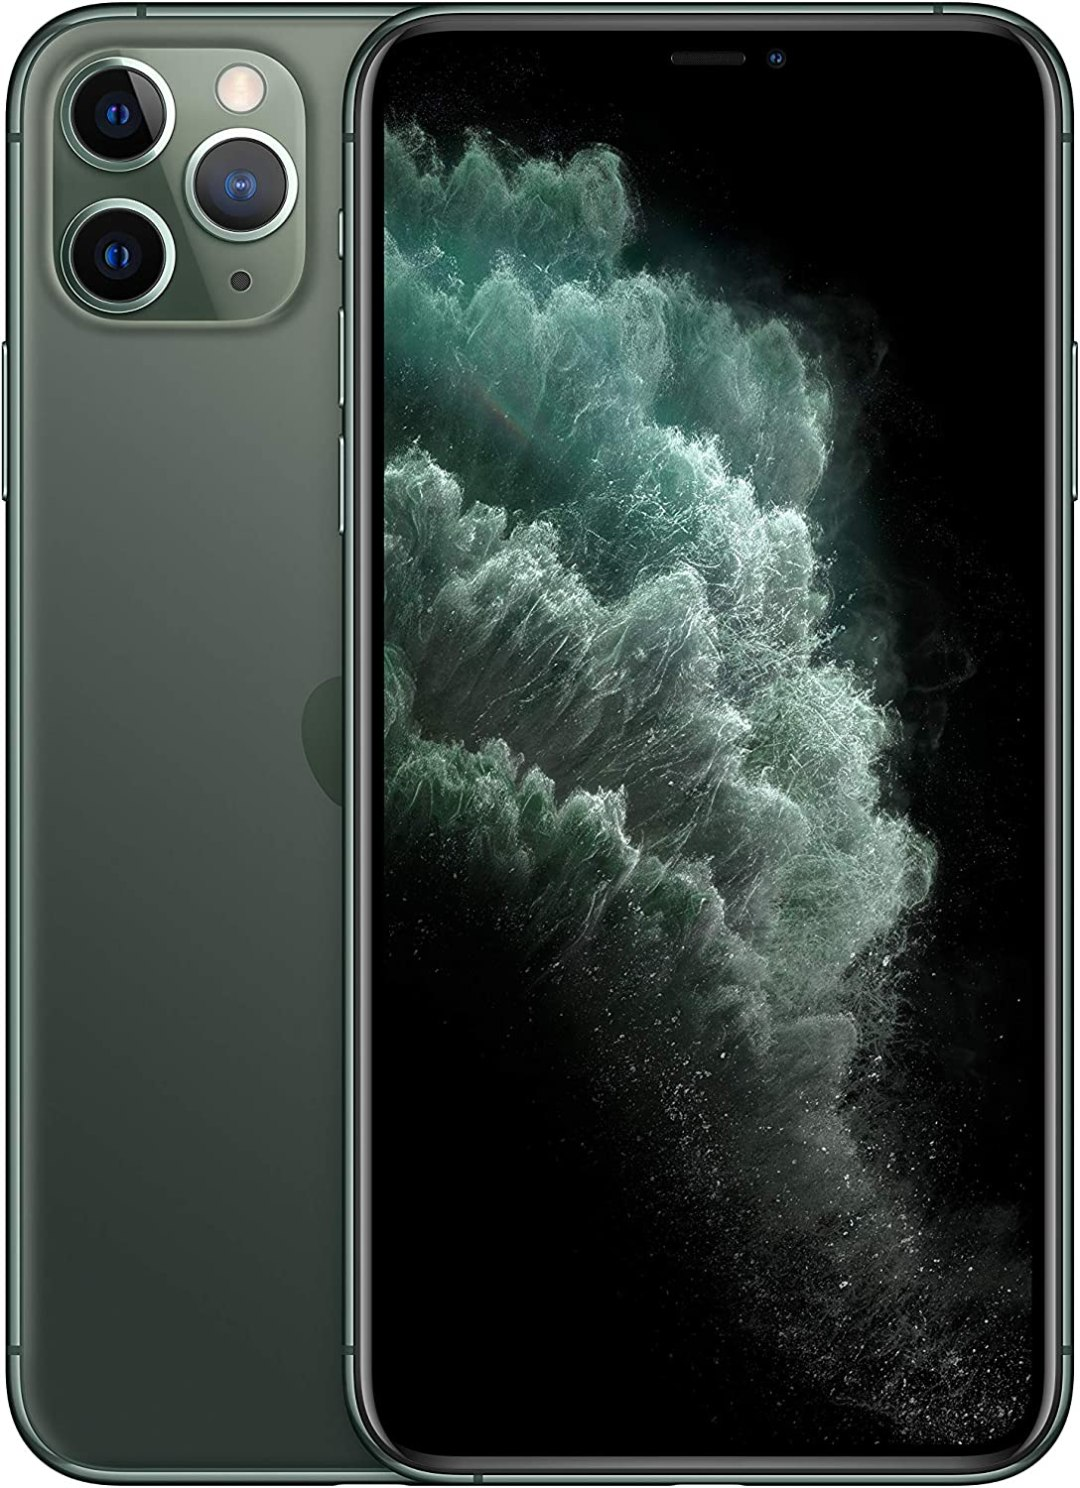 Apple iPhone 11 Pro Max (64Go) - Vert Nuit